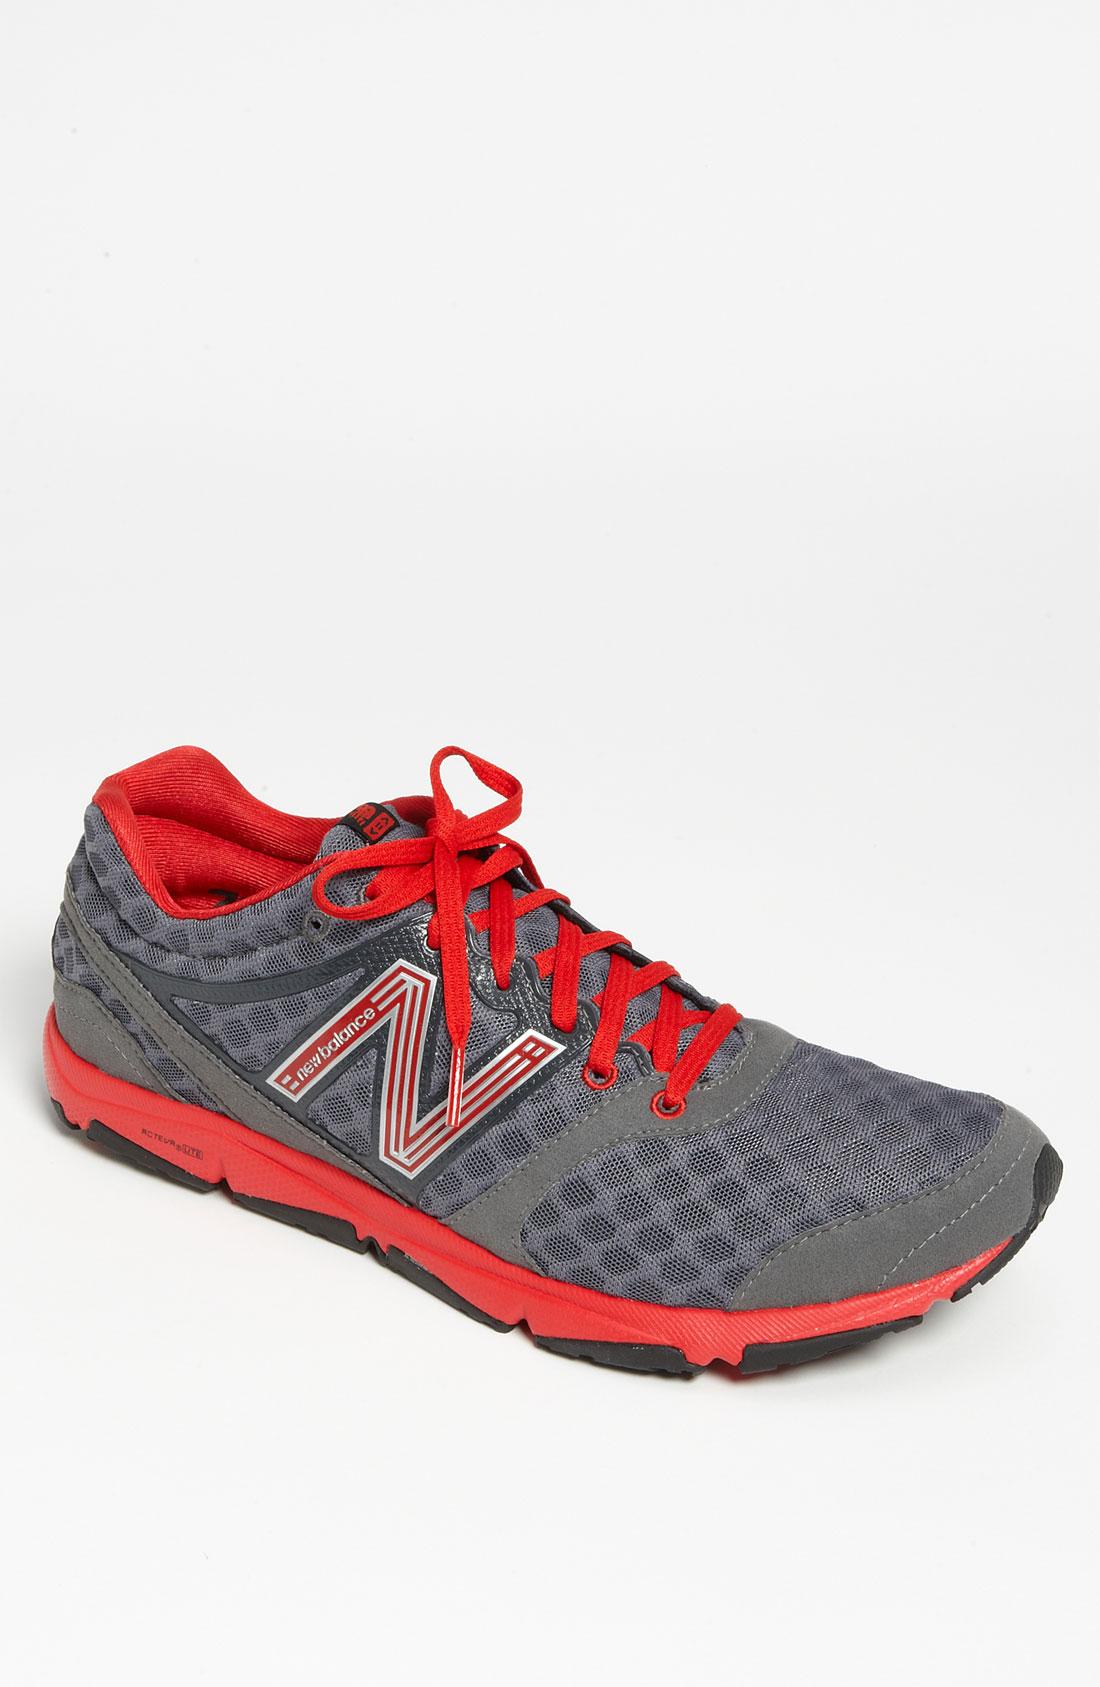 Diesel New Shoes